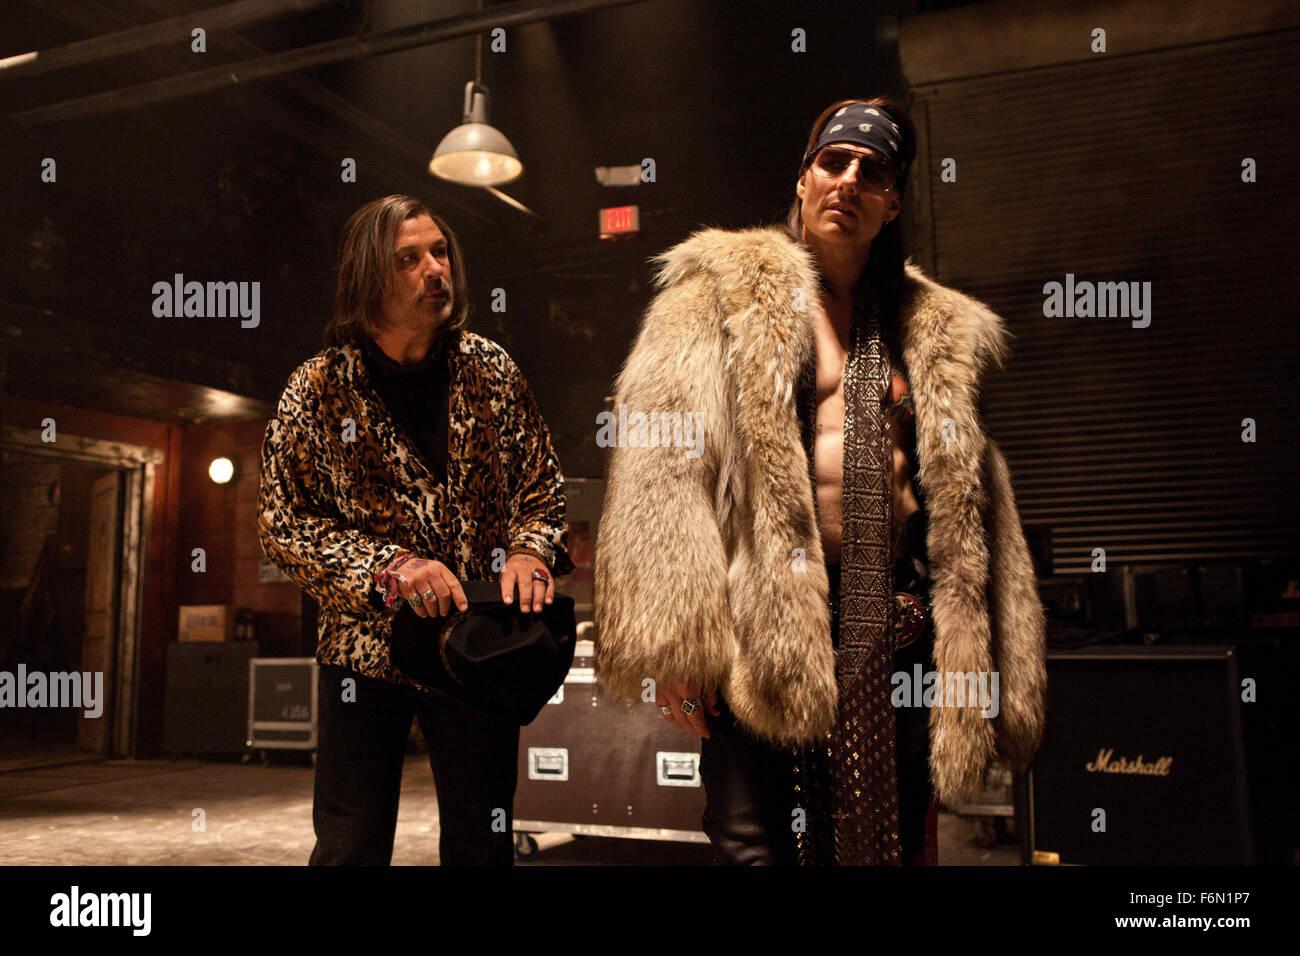 RELEASE DATE: June 1, 2012   MOVIE TITLE: Rock of Ages   STUDIO: Offspring Entertainment   DIRECTOR: Adam Shankman Stock Photo